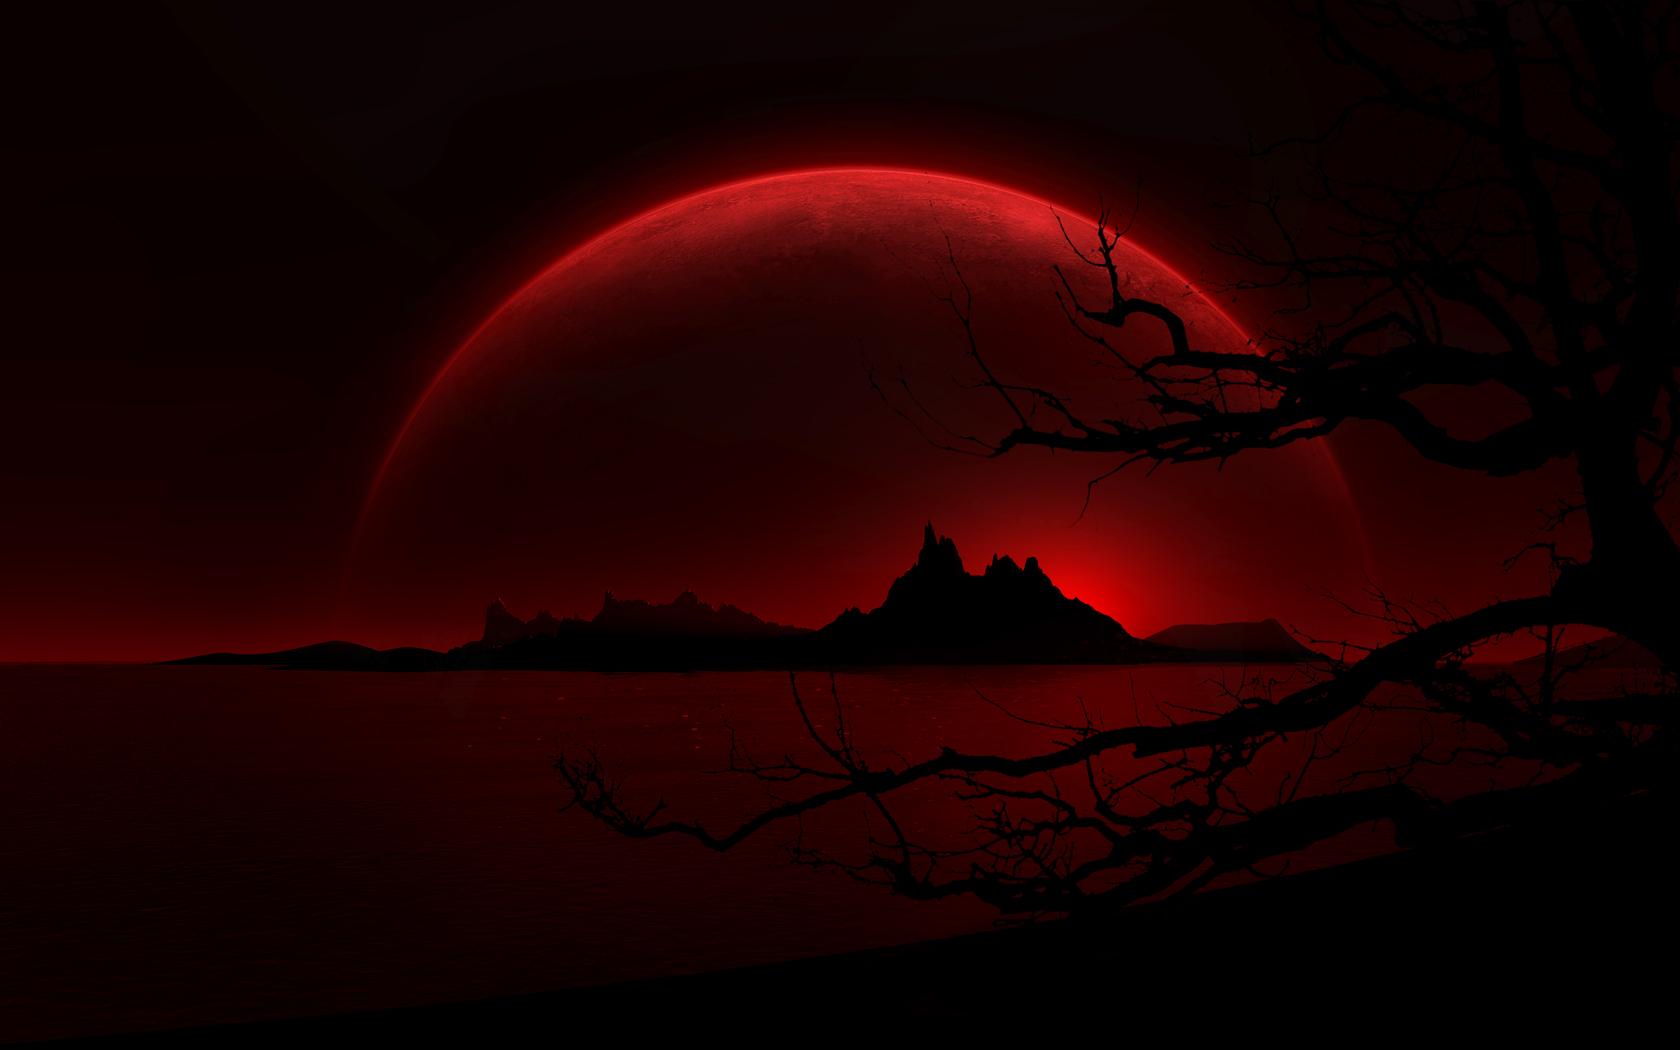 Тьма - пейзаж  Красный месяц Netherworld Louise монстр Обои